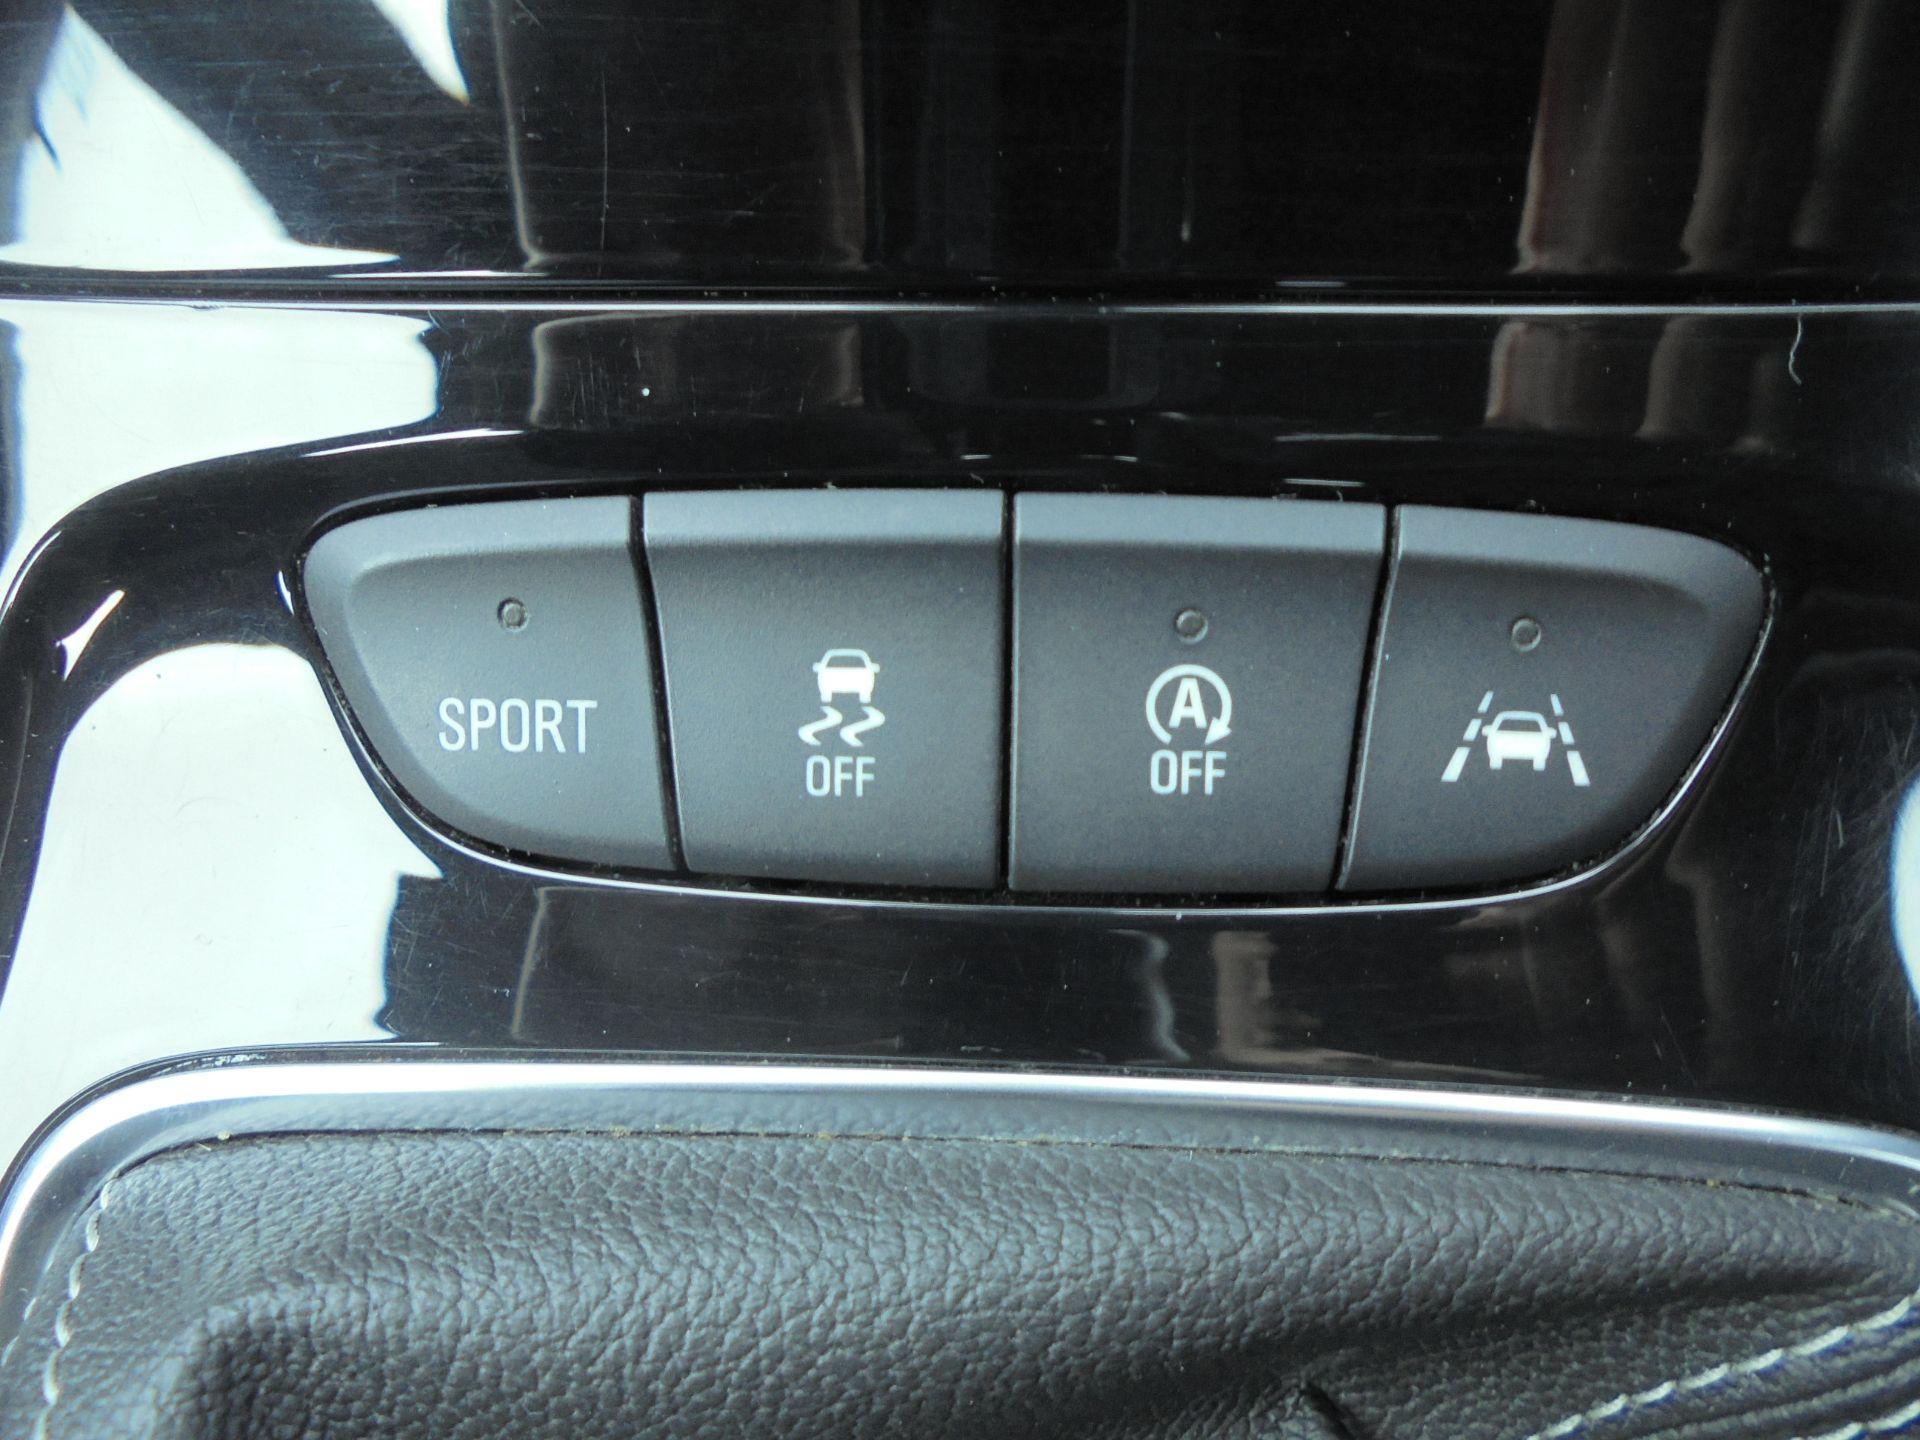 2018 Vauxhall Astra Sports Tourer 1.6 Cdti 16V 136 Sri Nav 5Dr (VU18DFJ) Image 17